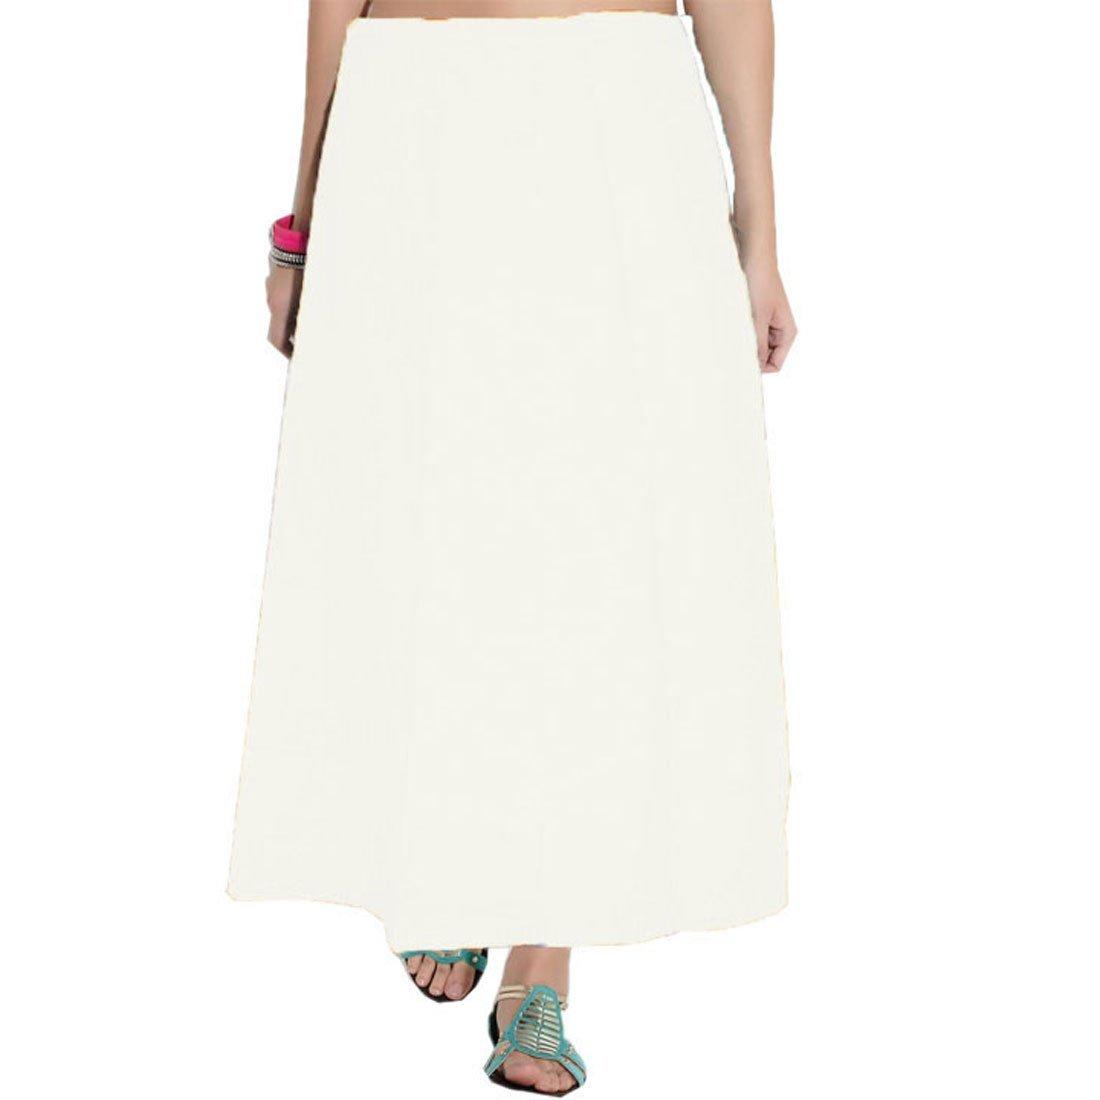 Odishabazaar White Saree Inskirt Petticoat Cotton - Free Size